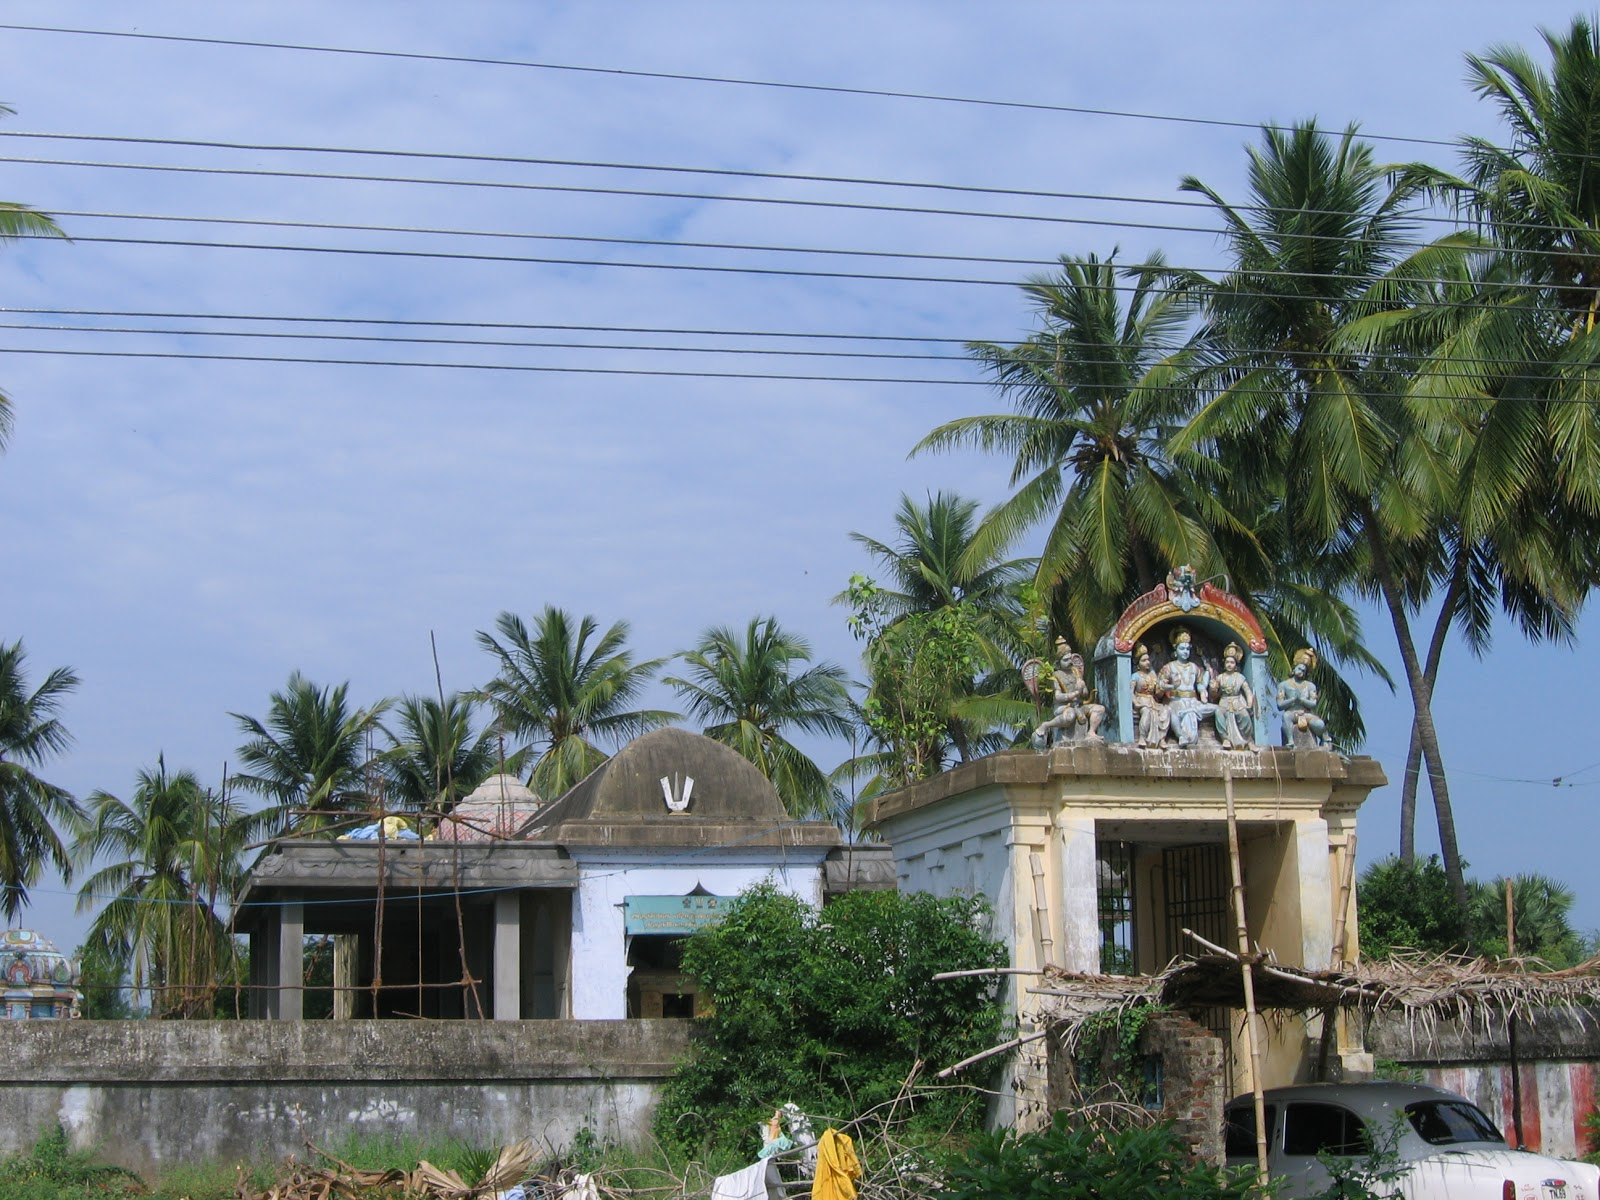 Sri Naan Madhiya Perumal Temple (Thalaichanga Naanmathiyam), Mayiladuthurai - Divya Desam 22